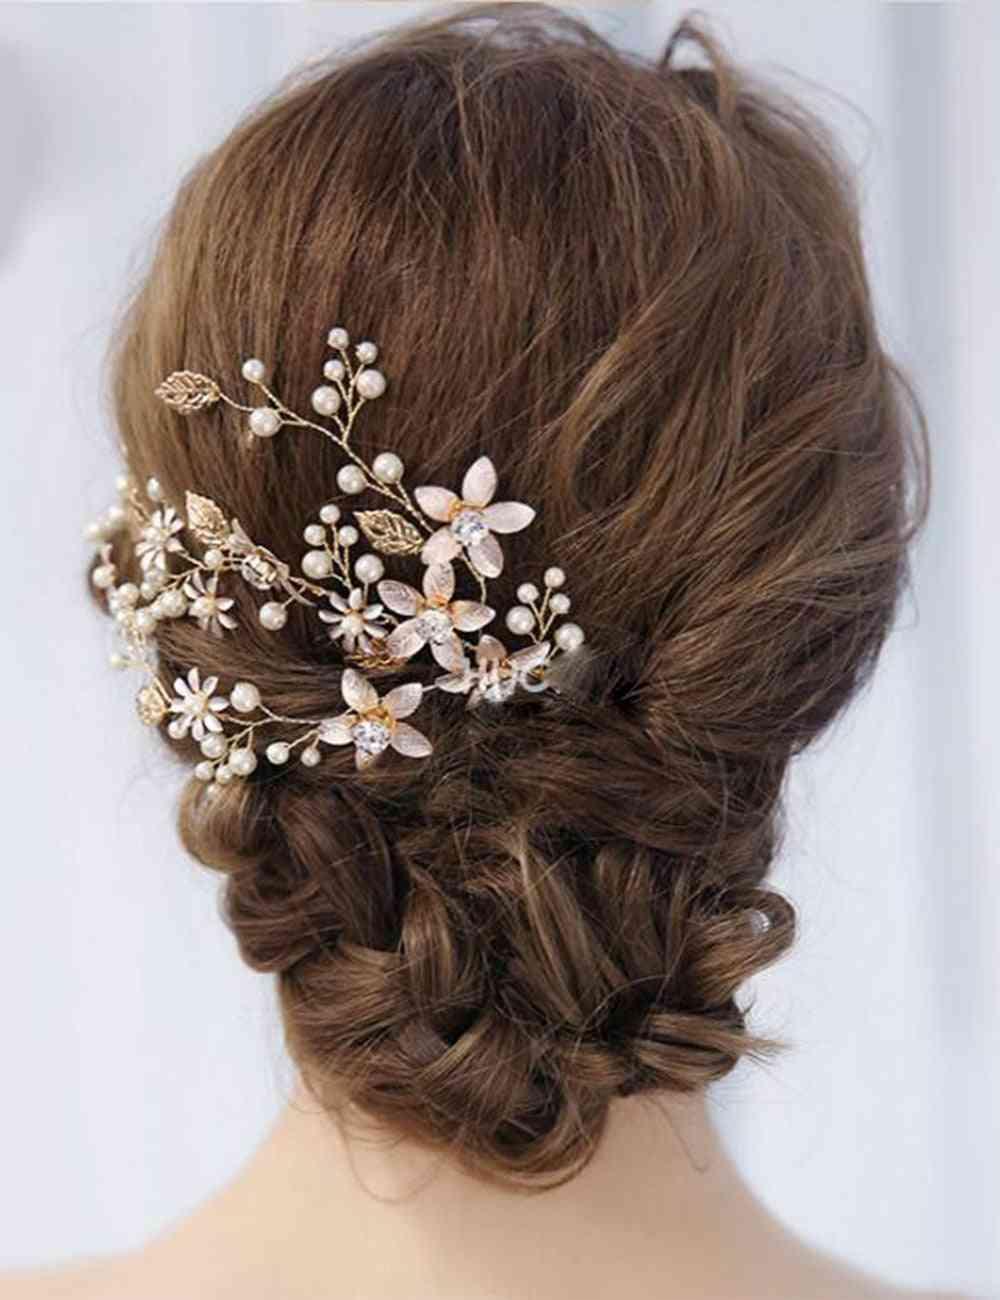 Vintage Gold, Leaves & Floral Crystal, Pearl Vine Headband, Hair Accessories (gold)